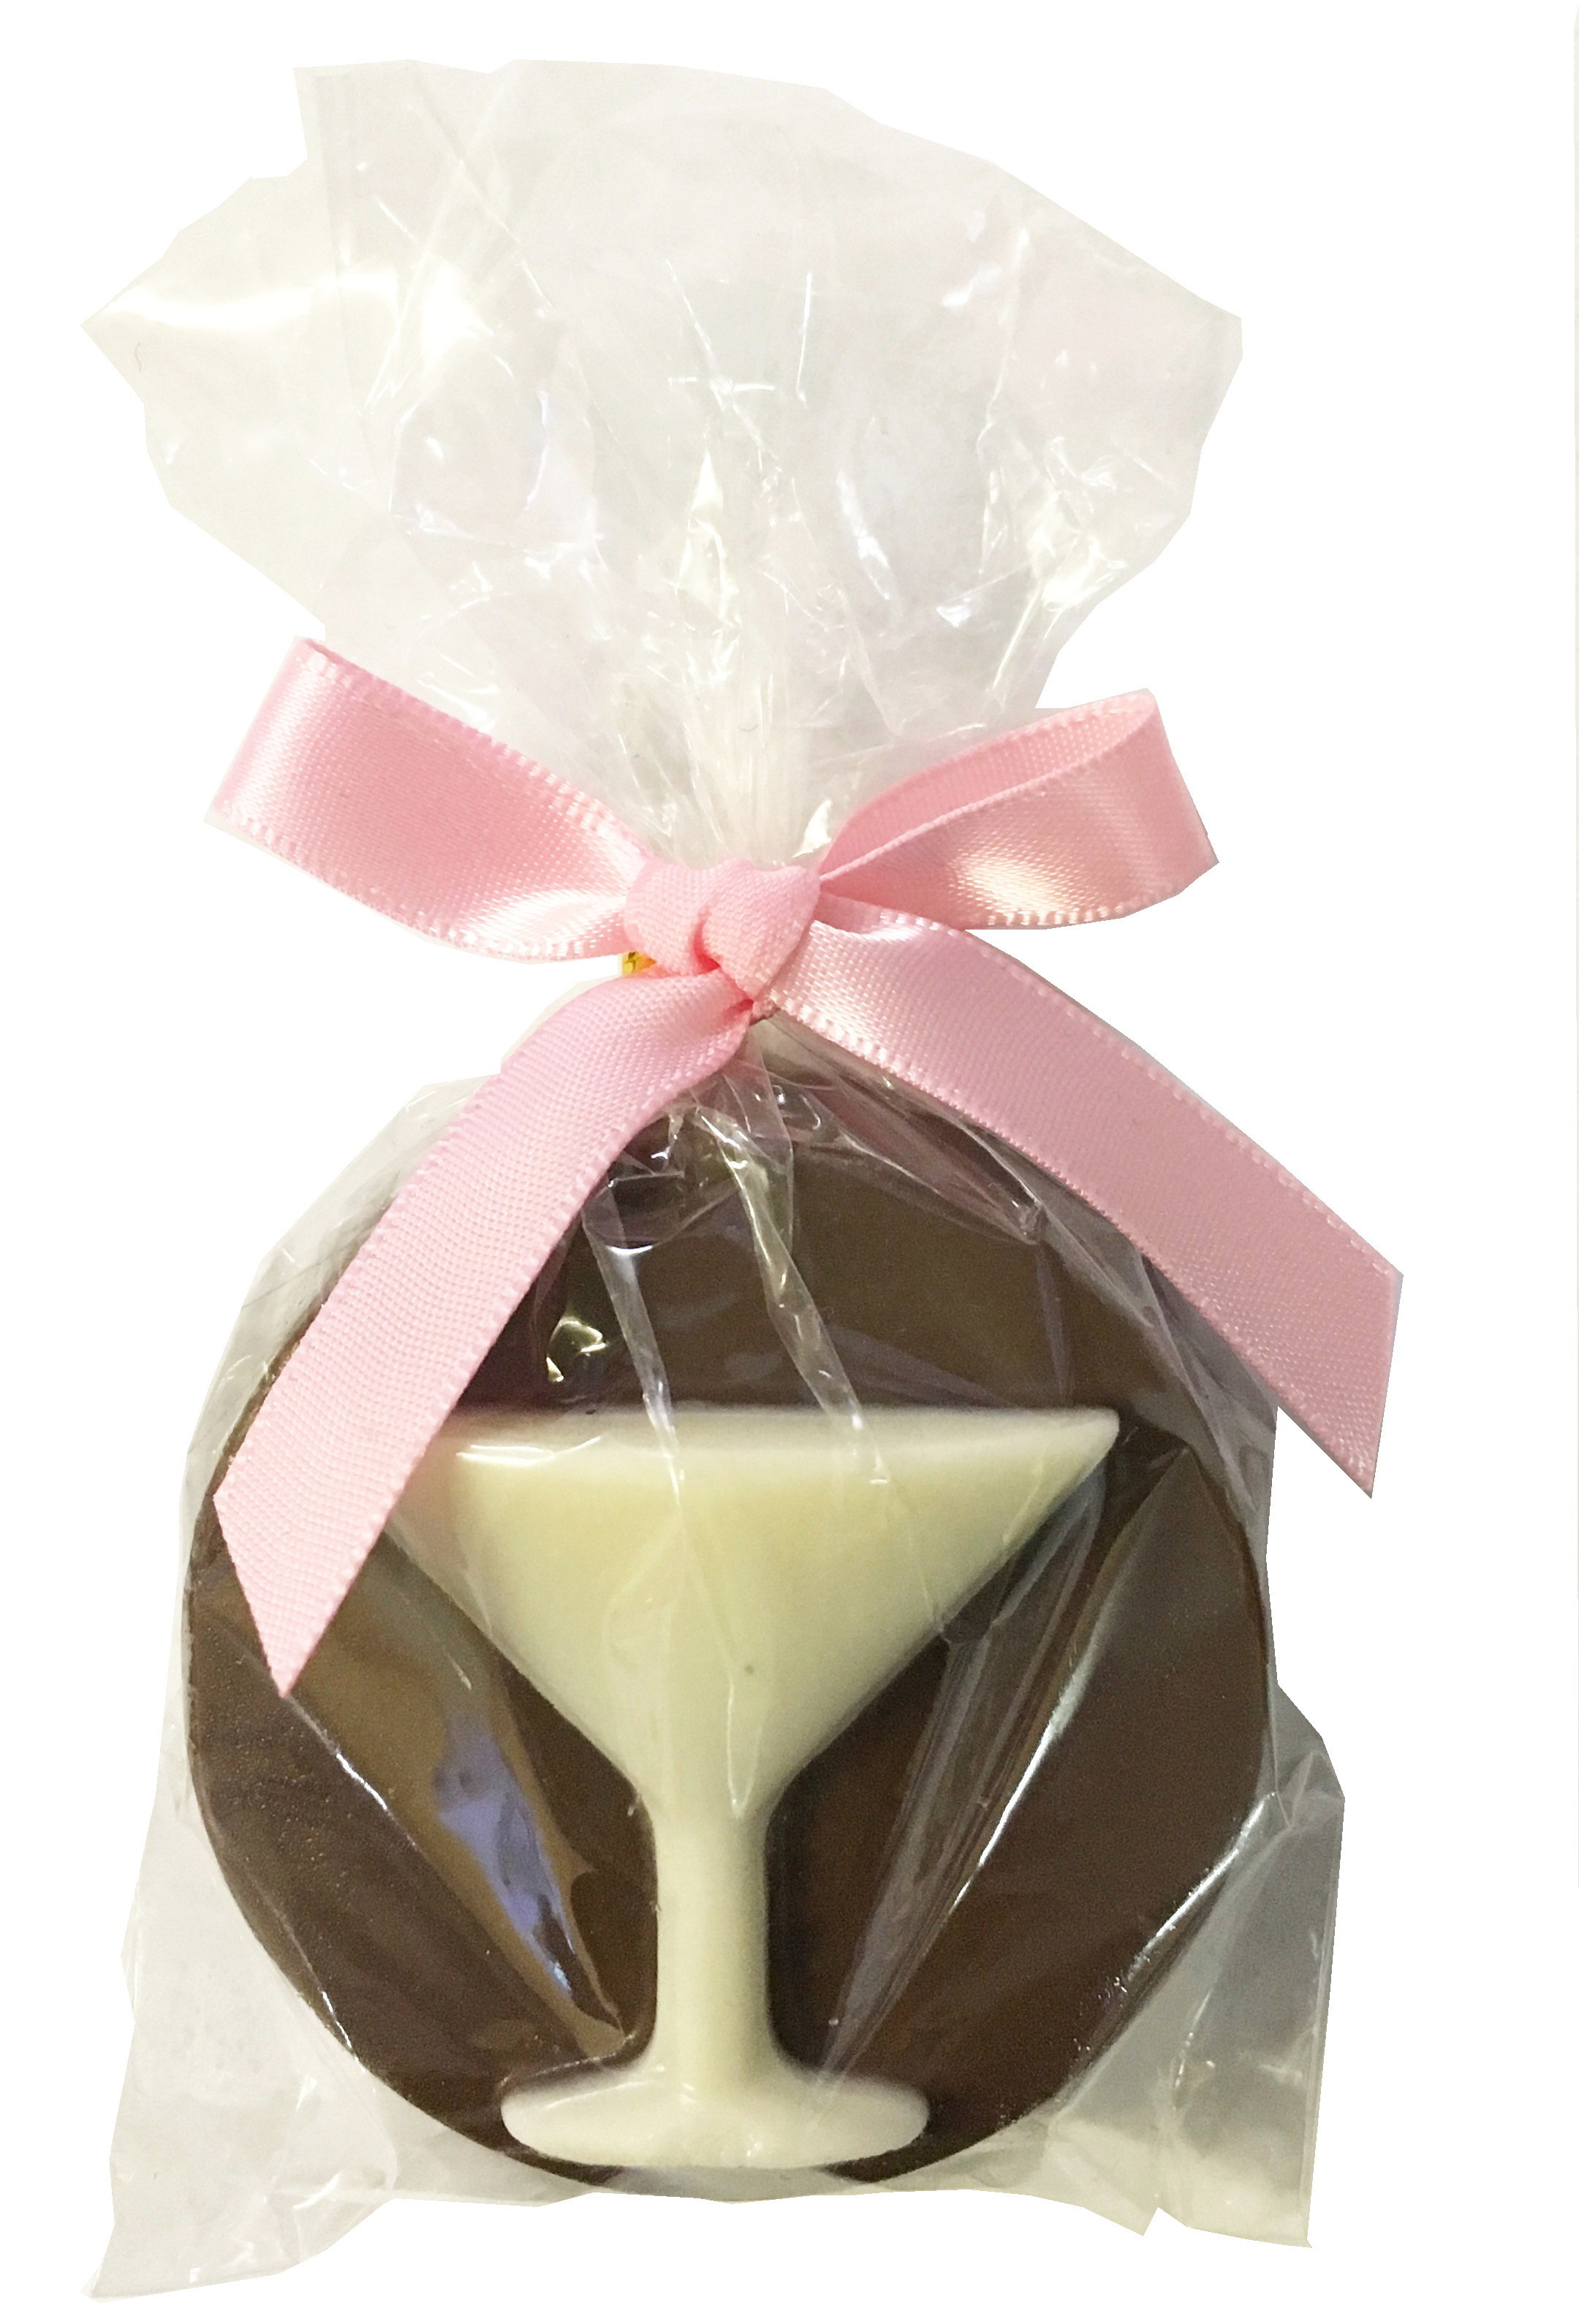 Gourmet Chocolate Molded Oreos® (Martini Glass) MO817